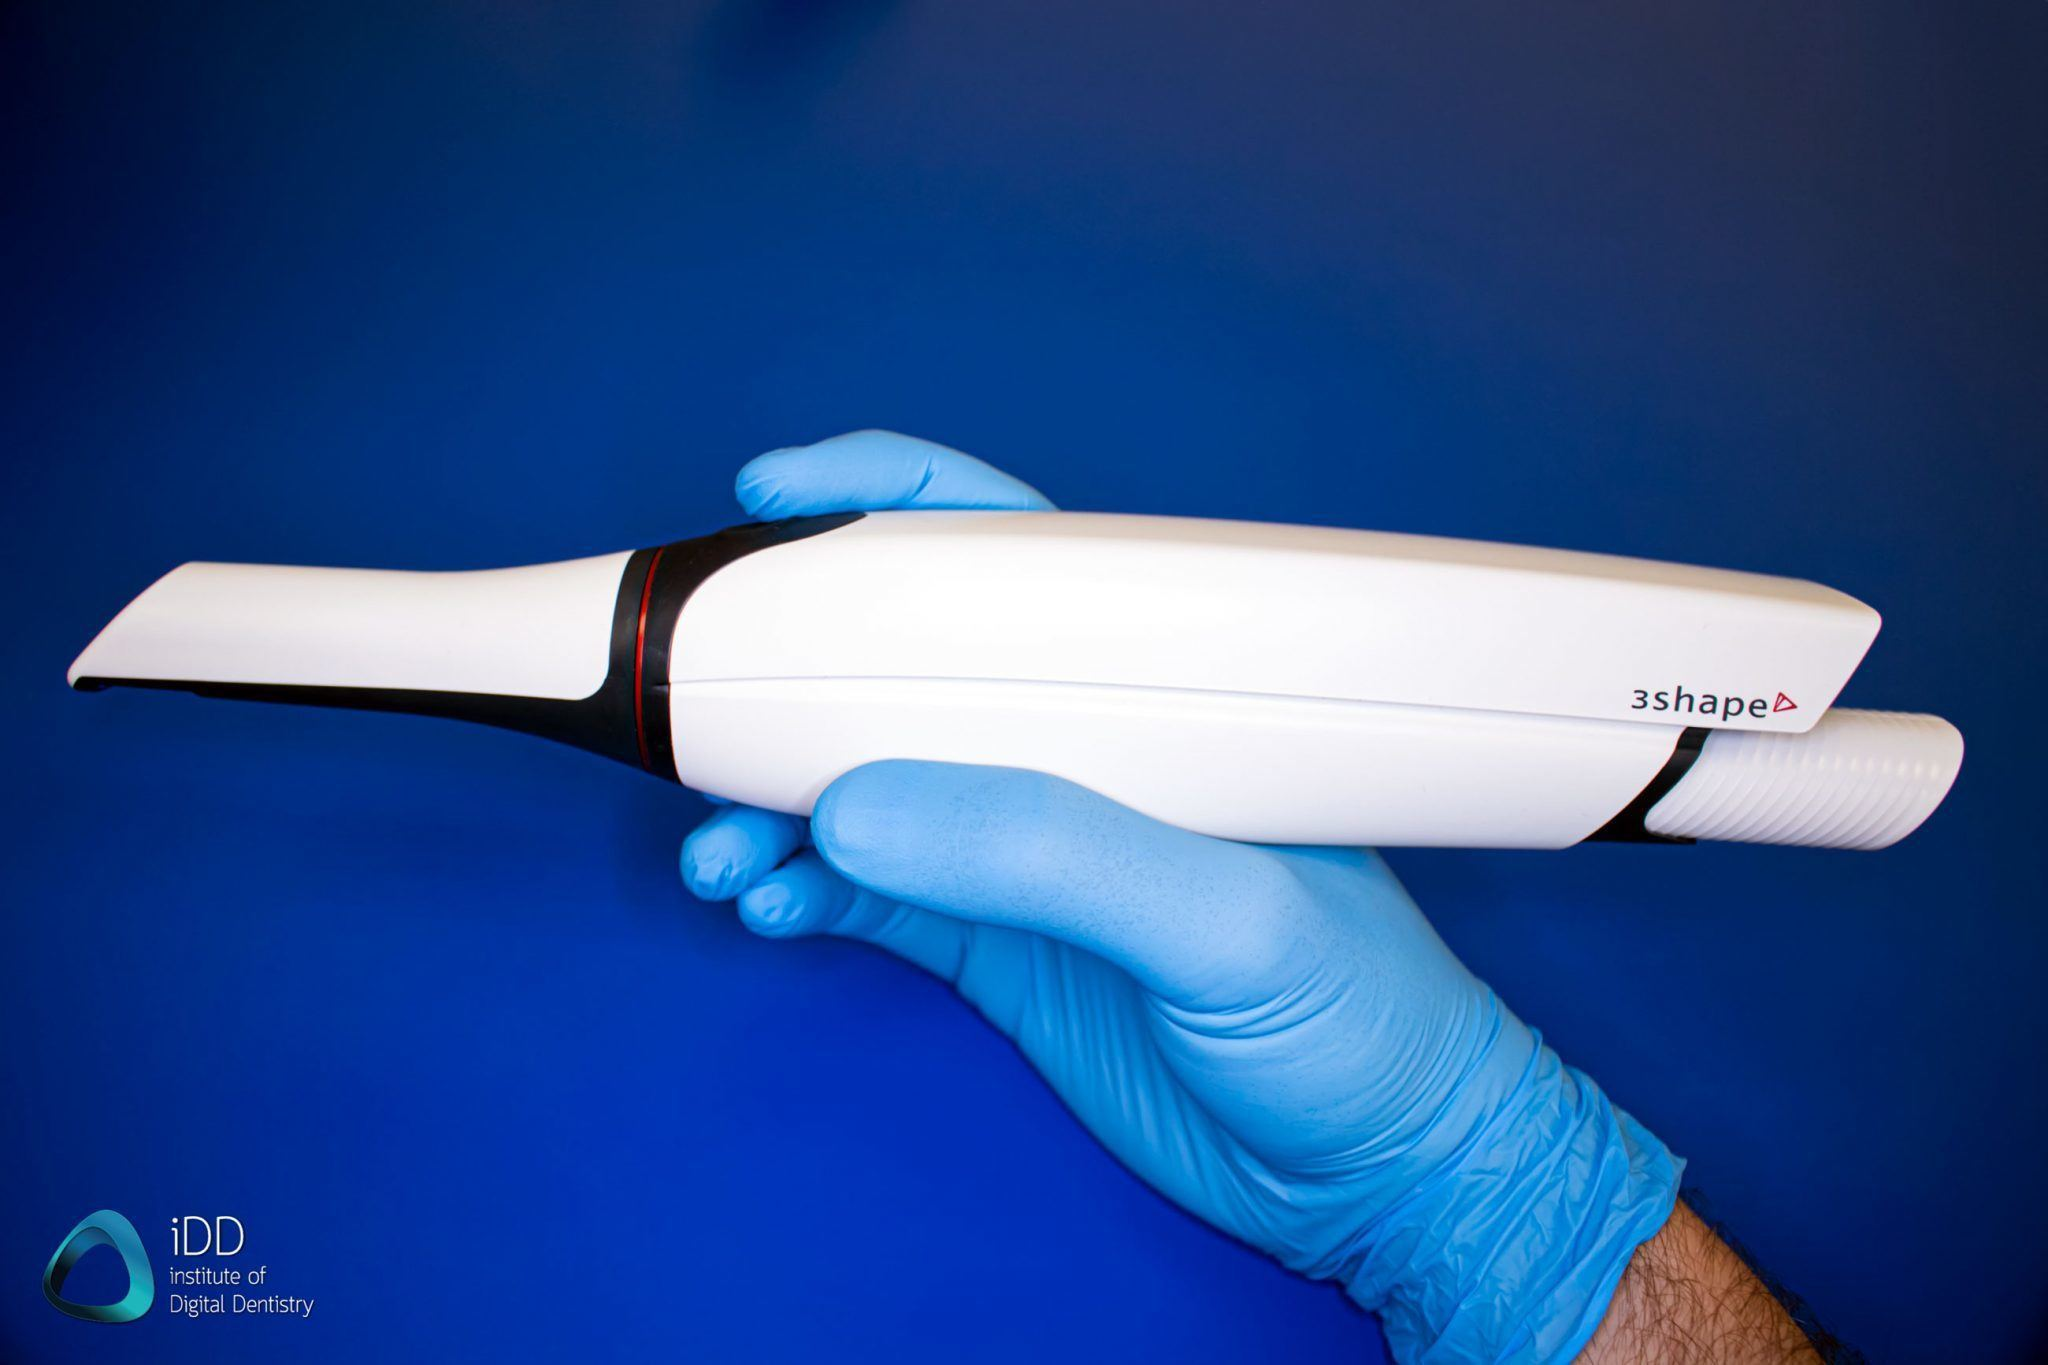 3shape-trios-4-review-ergonomics-scanner-handheld-institute-of-digital-dentistry